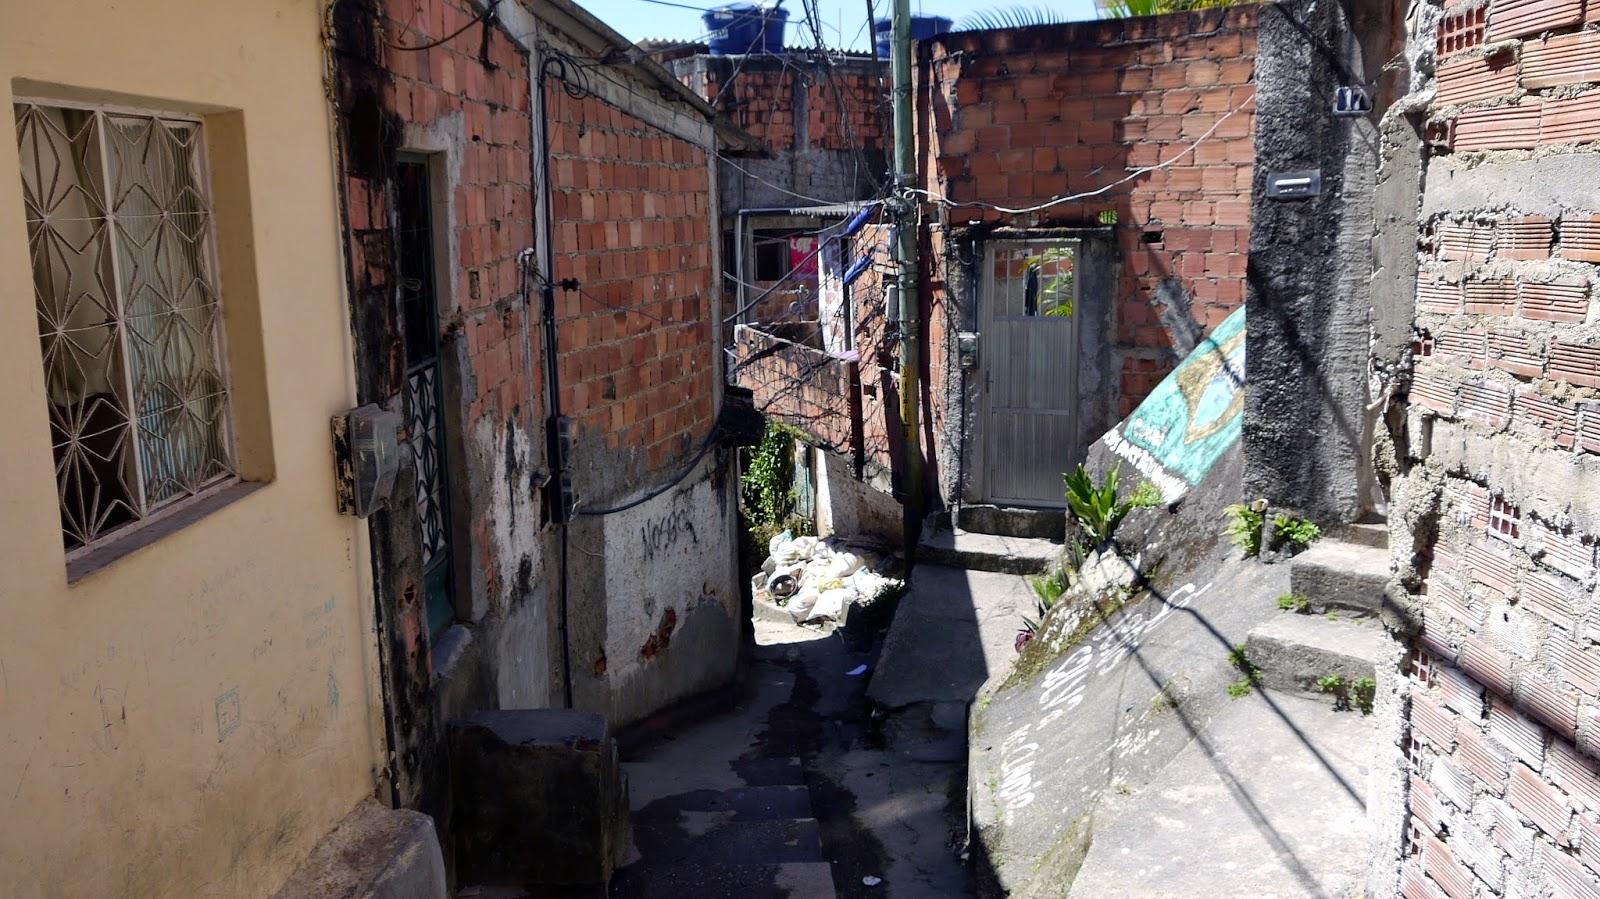 Slum in Rio de Janeiro